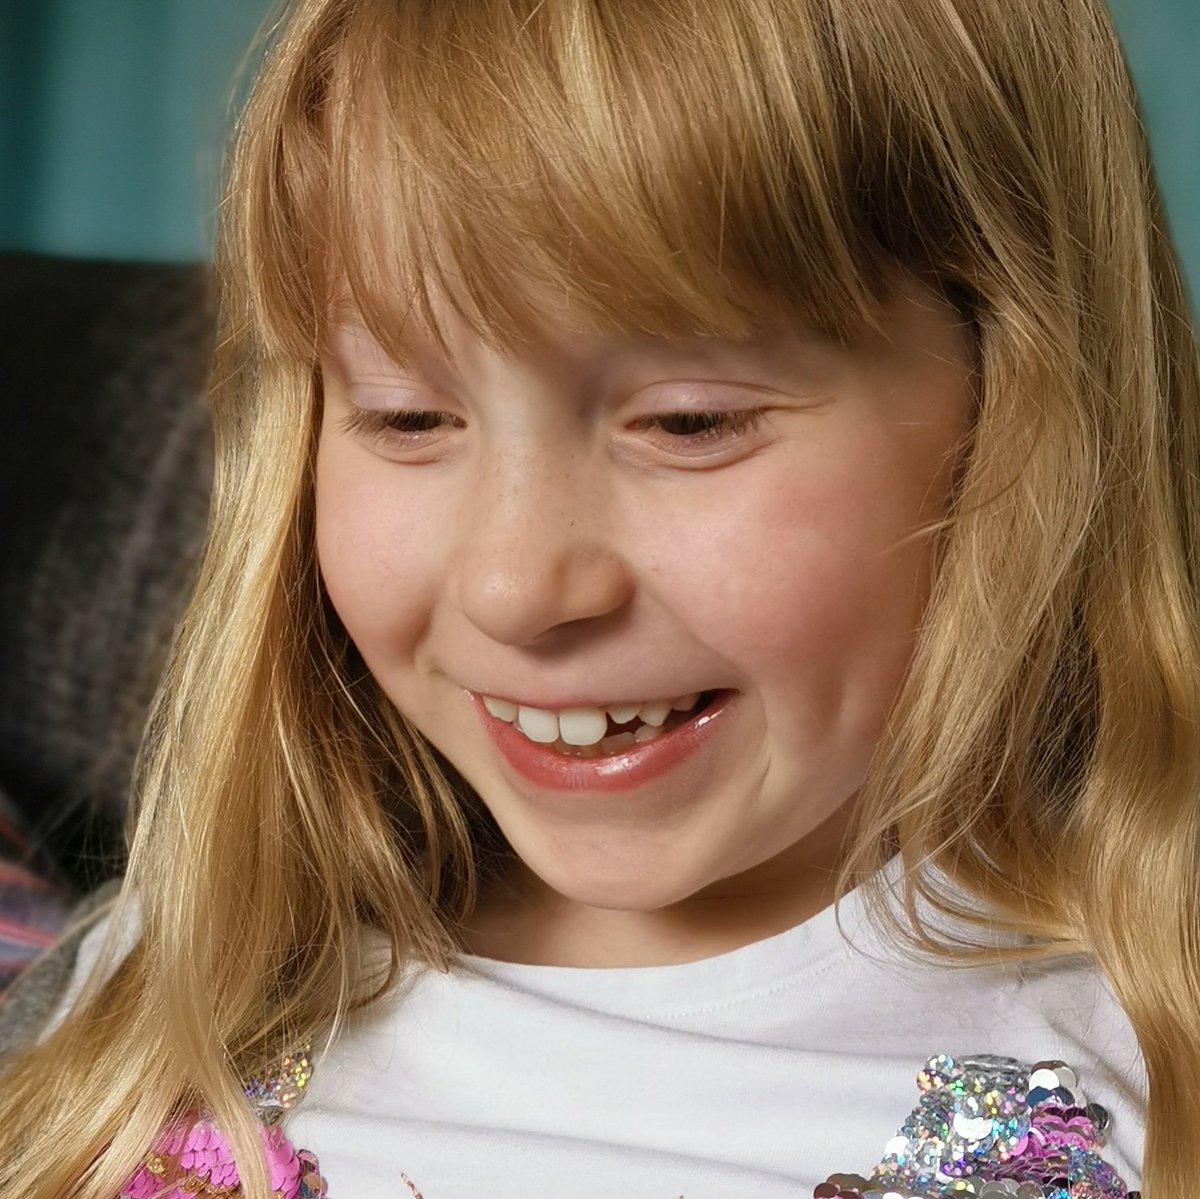 The kid, those teeth, that strawberry hair. 😍 Xx #daughter #motherhood #photo #beautiful #nofilter #strawberryblondehair